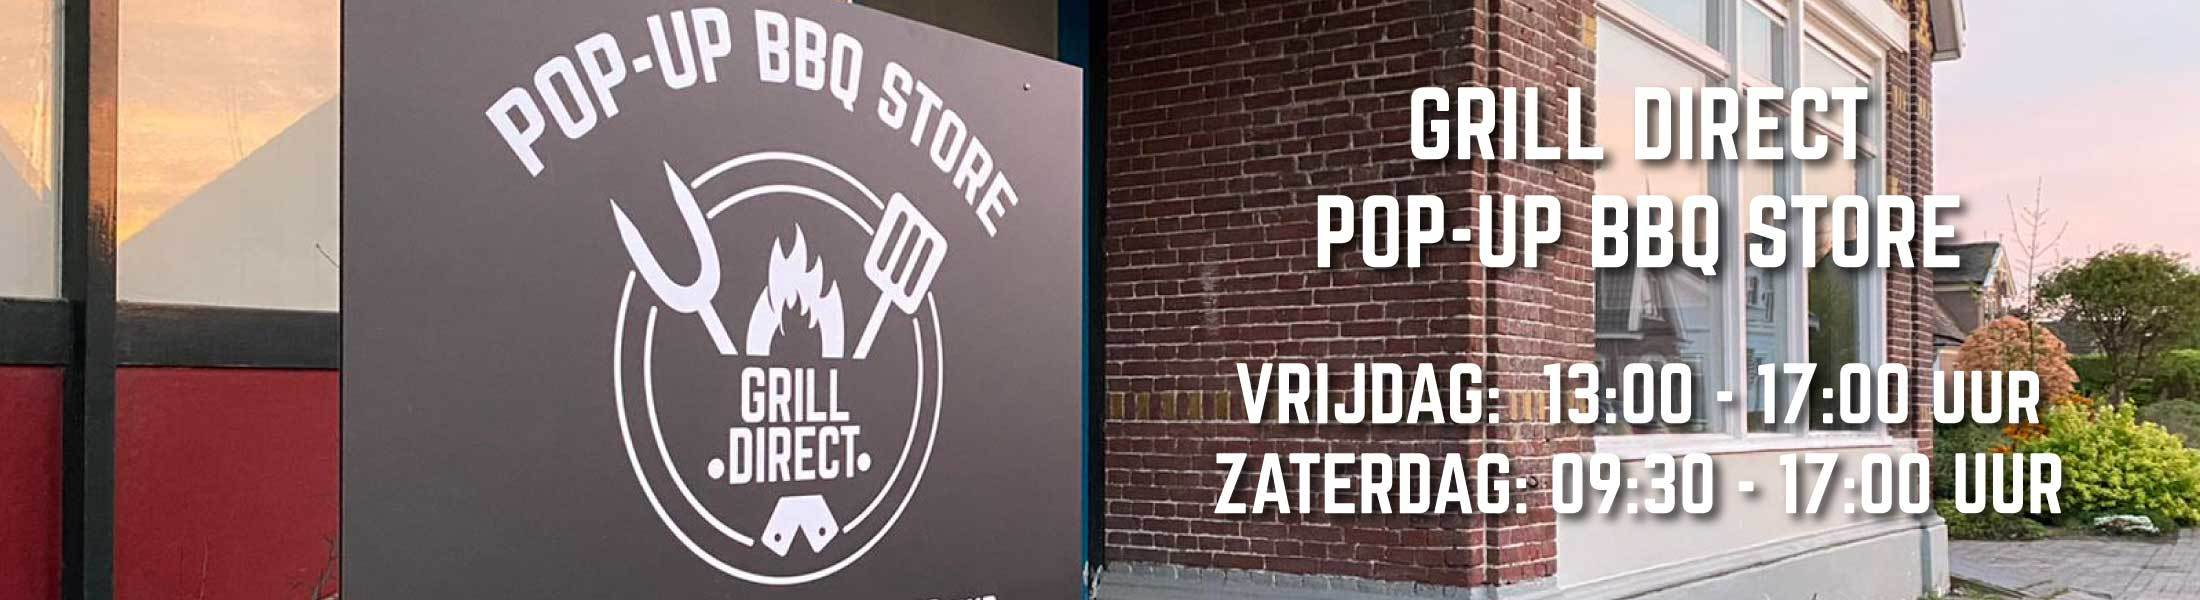 Pop-up bbq store